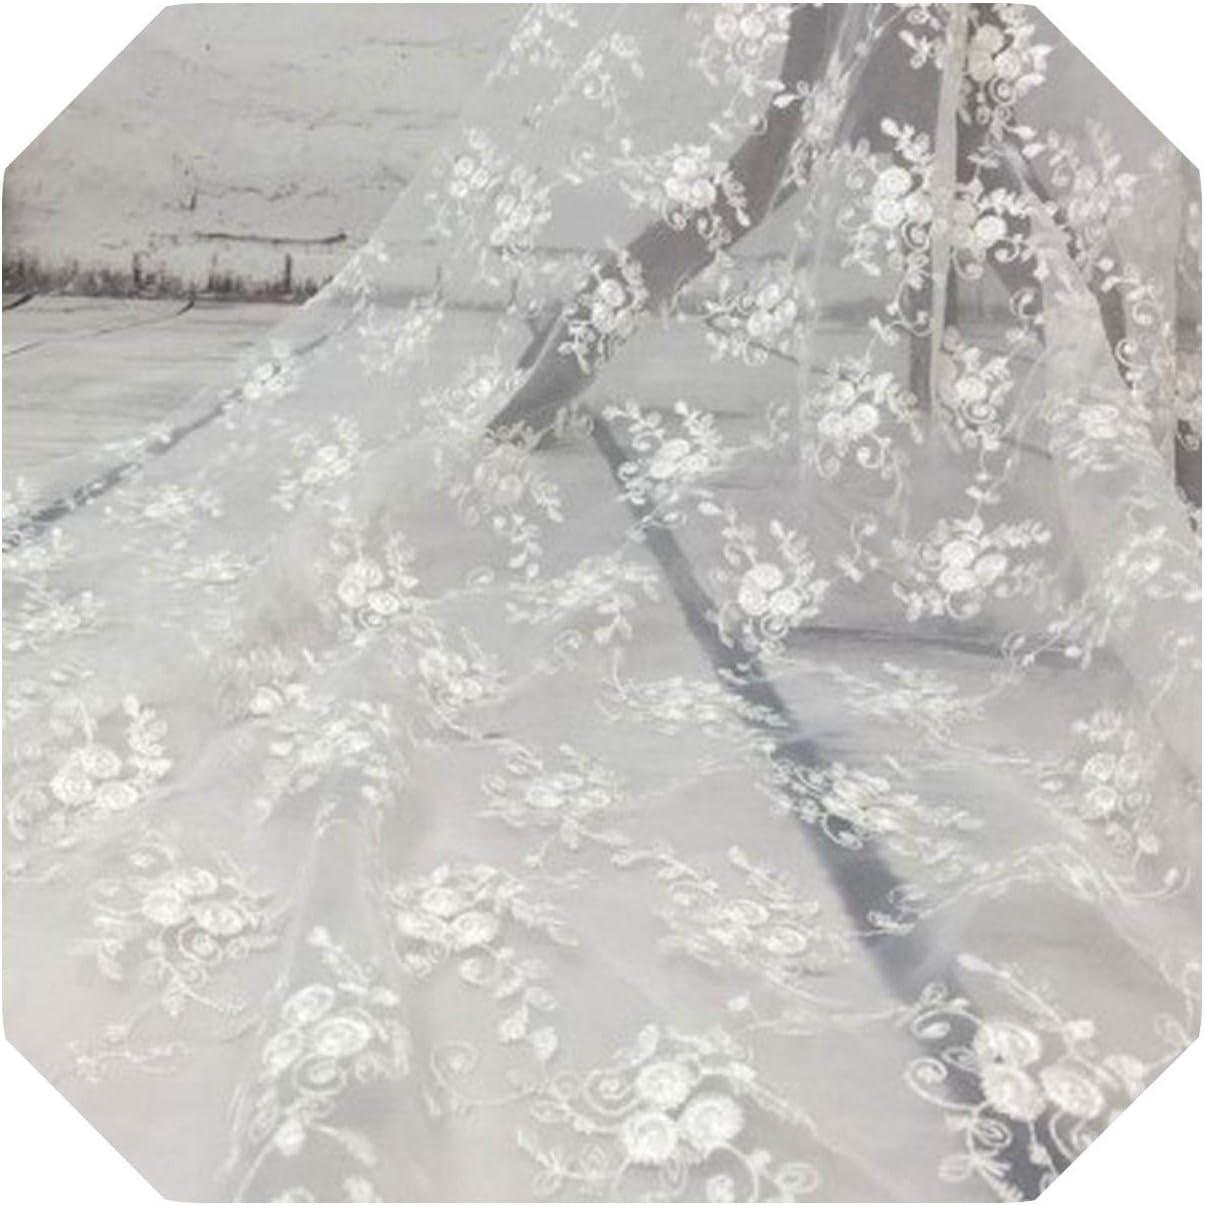 Tejido Para Tapicería | 1 yarda 130 cm ancho neto encaje francés gasa guipur tul tela de encaje de malla para vestido de novia oro blanco rosa azul púrpura-blanco-